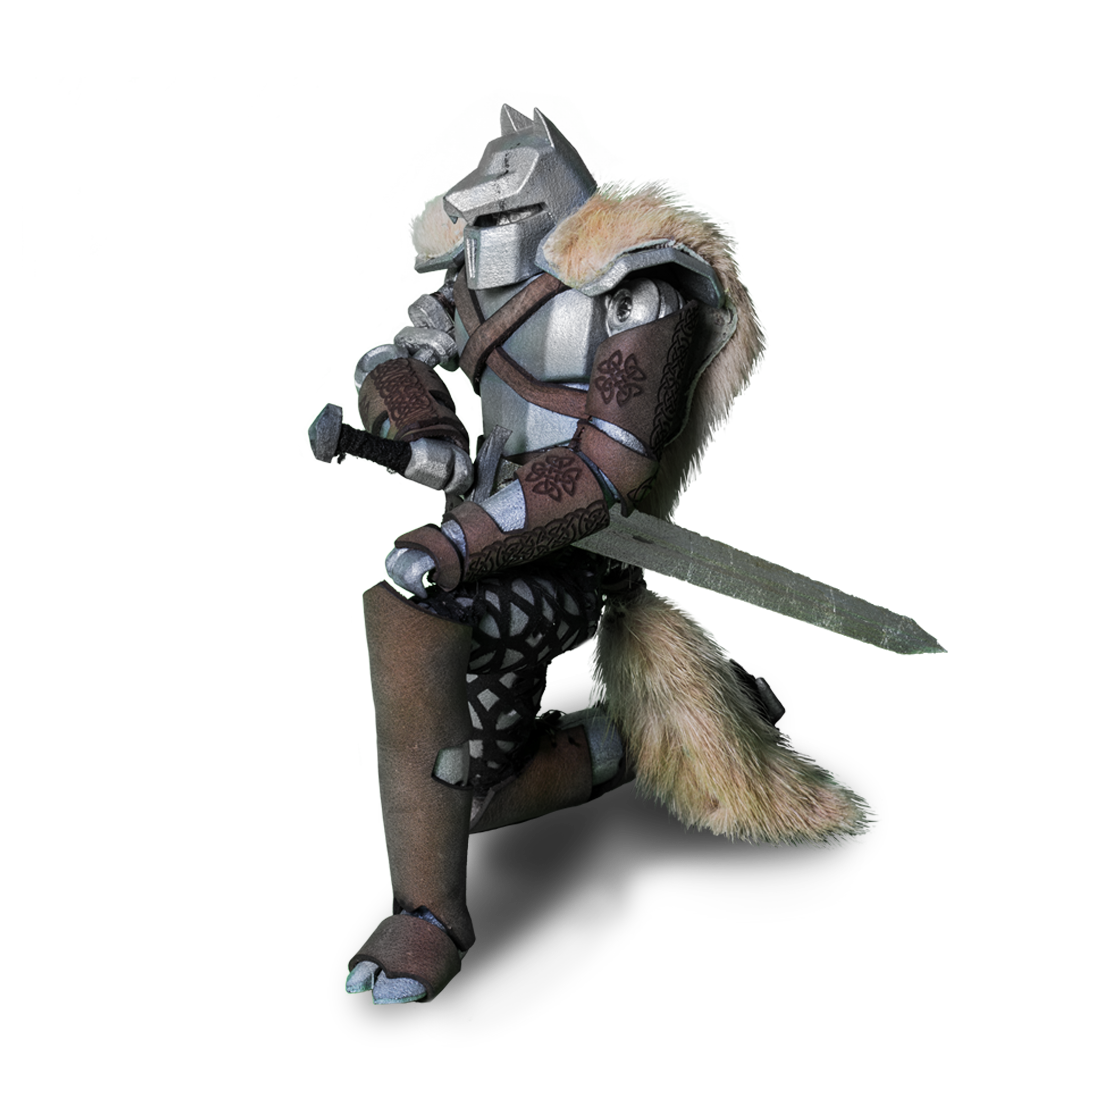 tyr_gamelab_character_design_remion_design_budapest_03